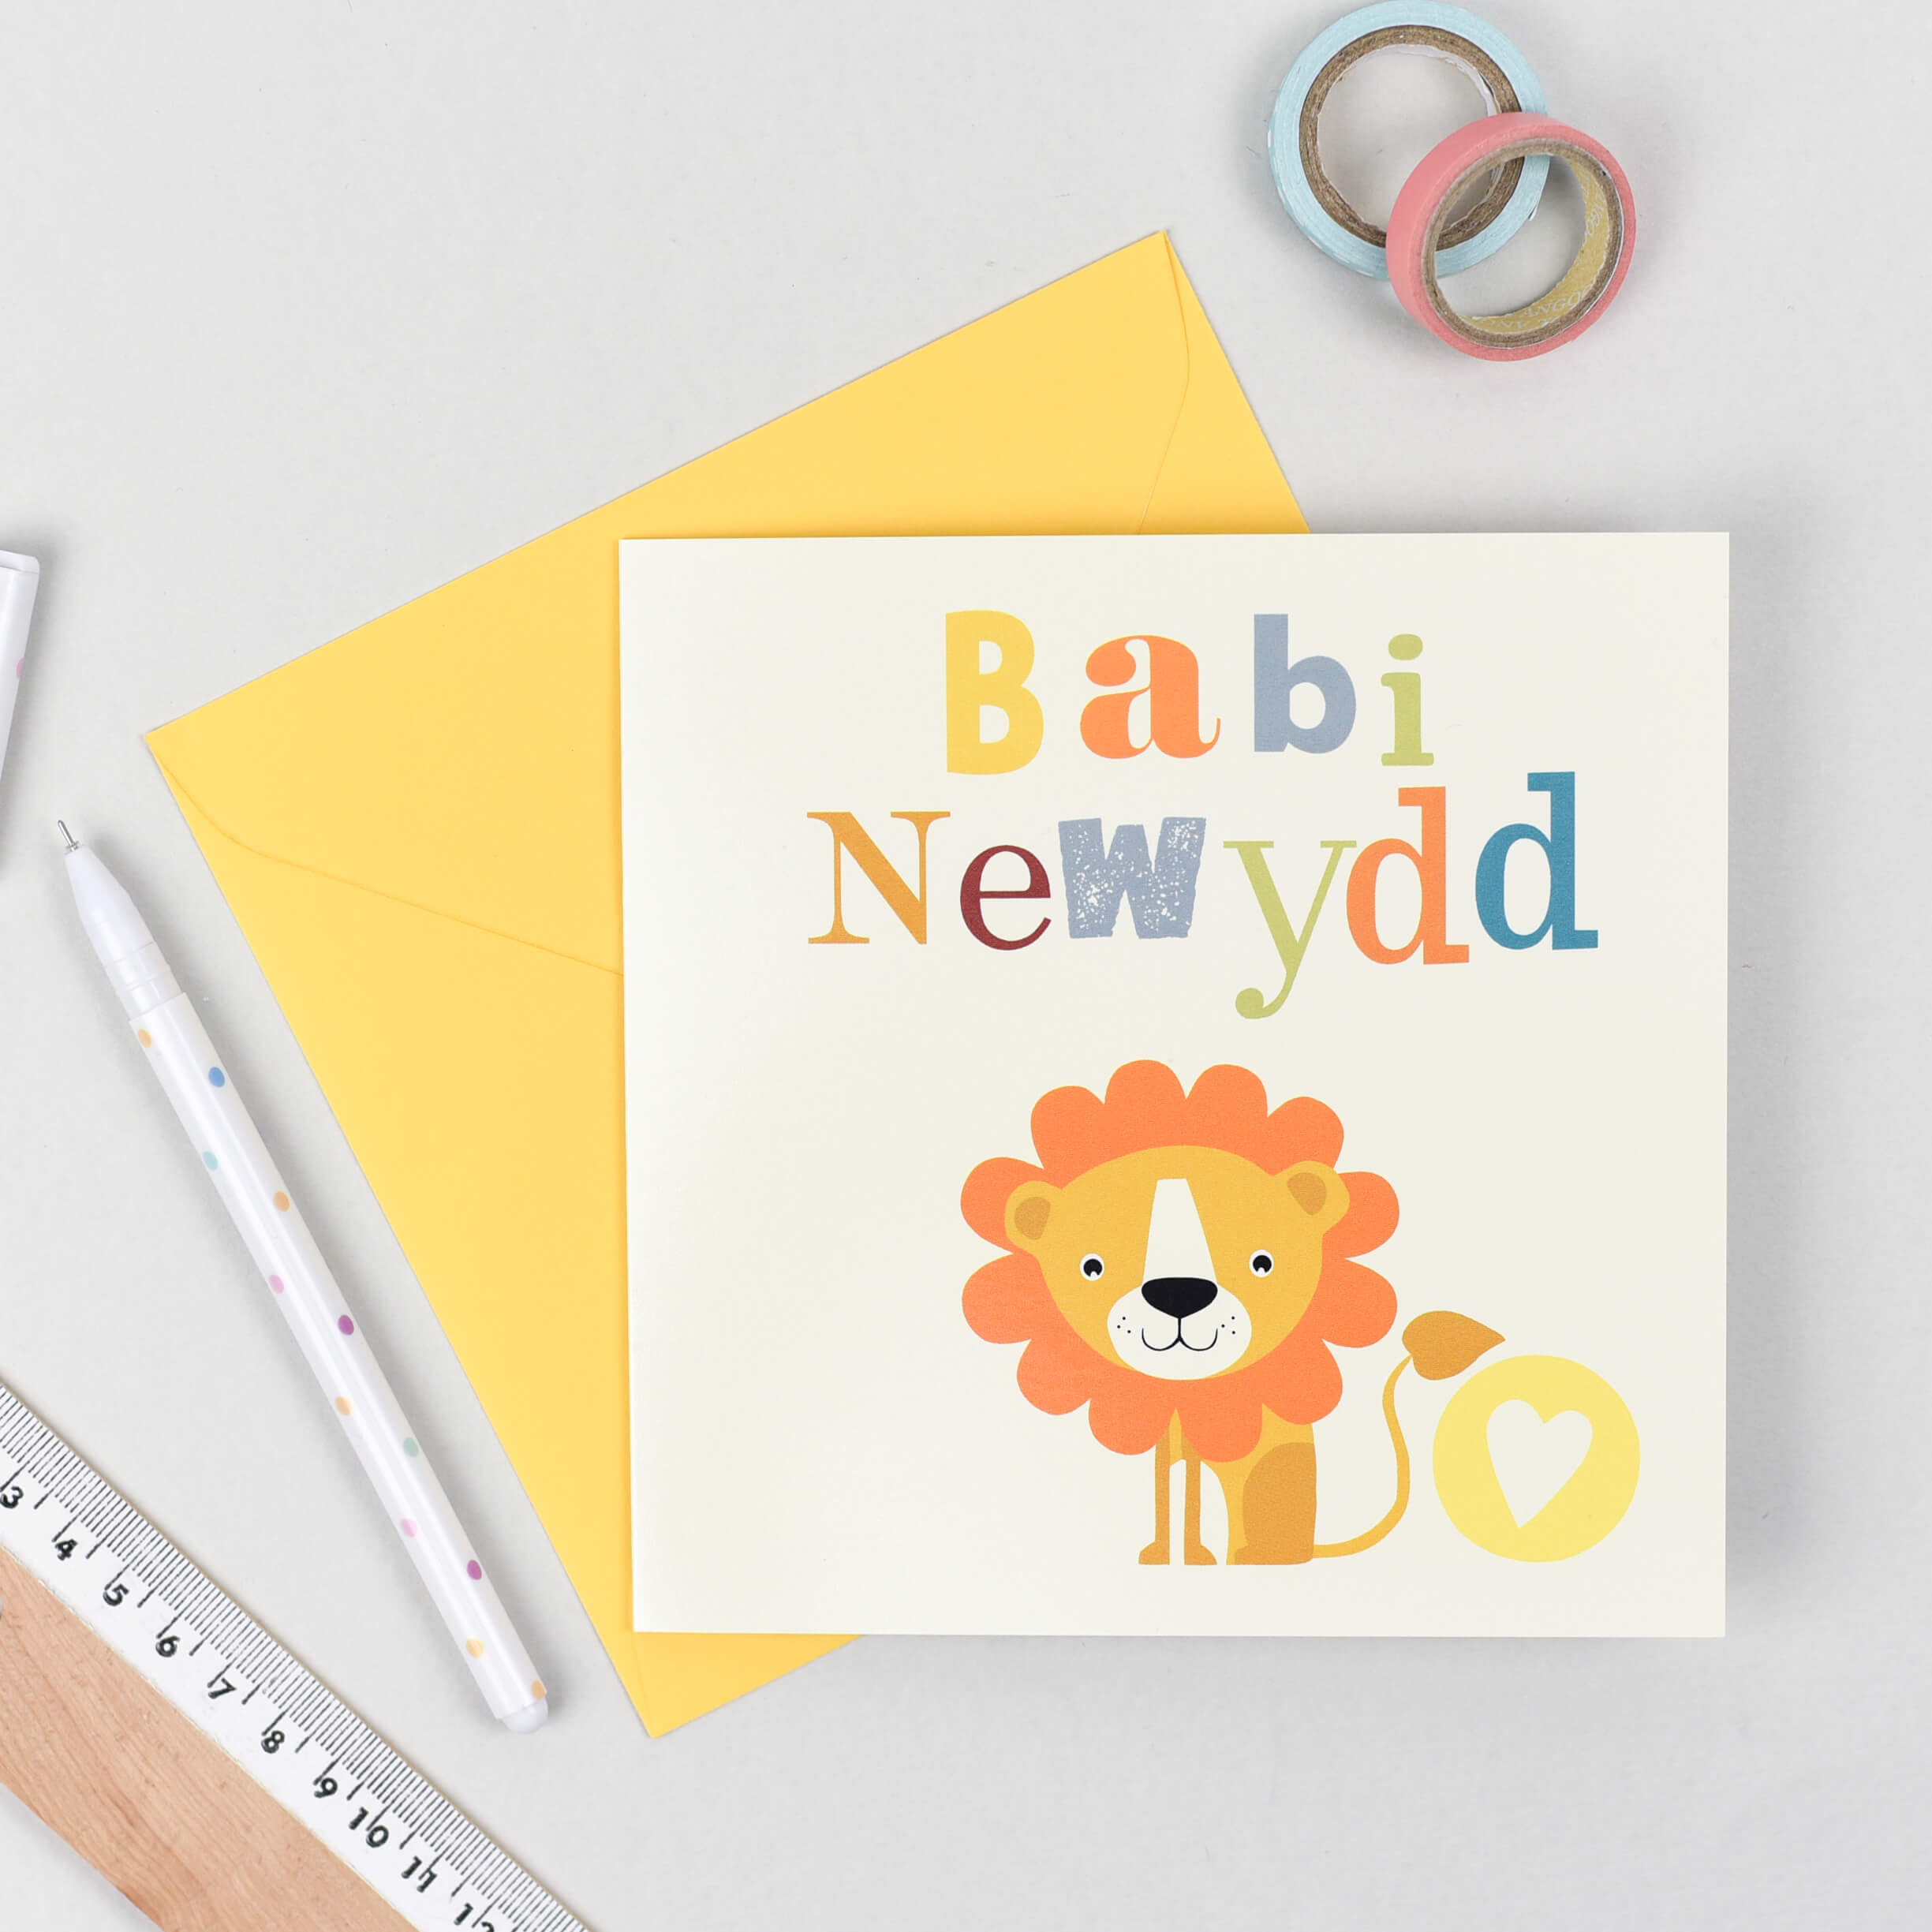 Babi Newydd- New Baby -